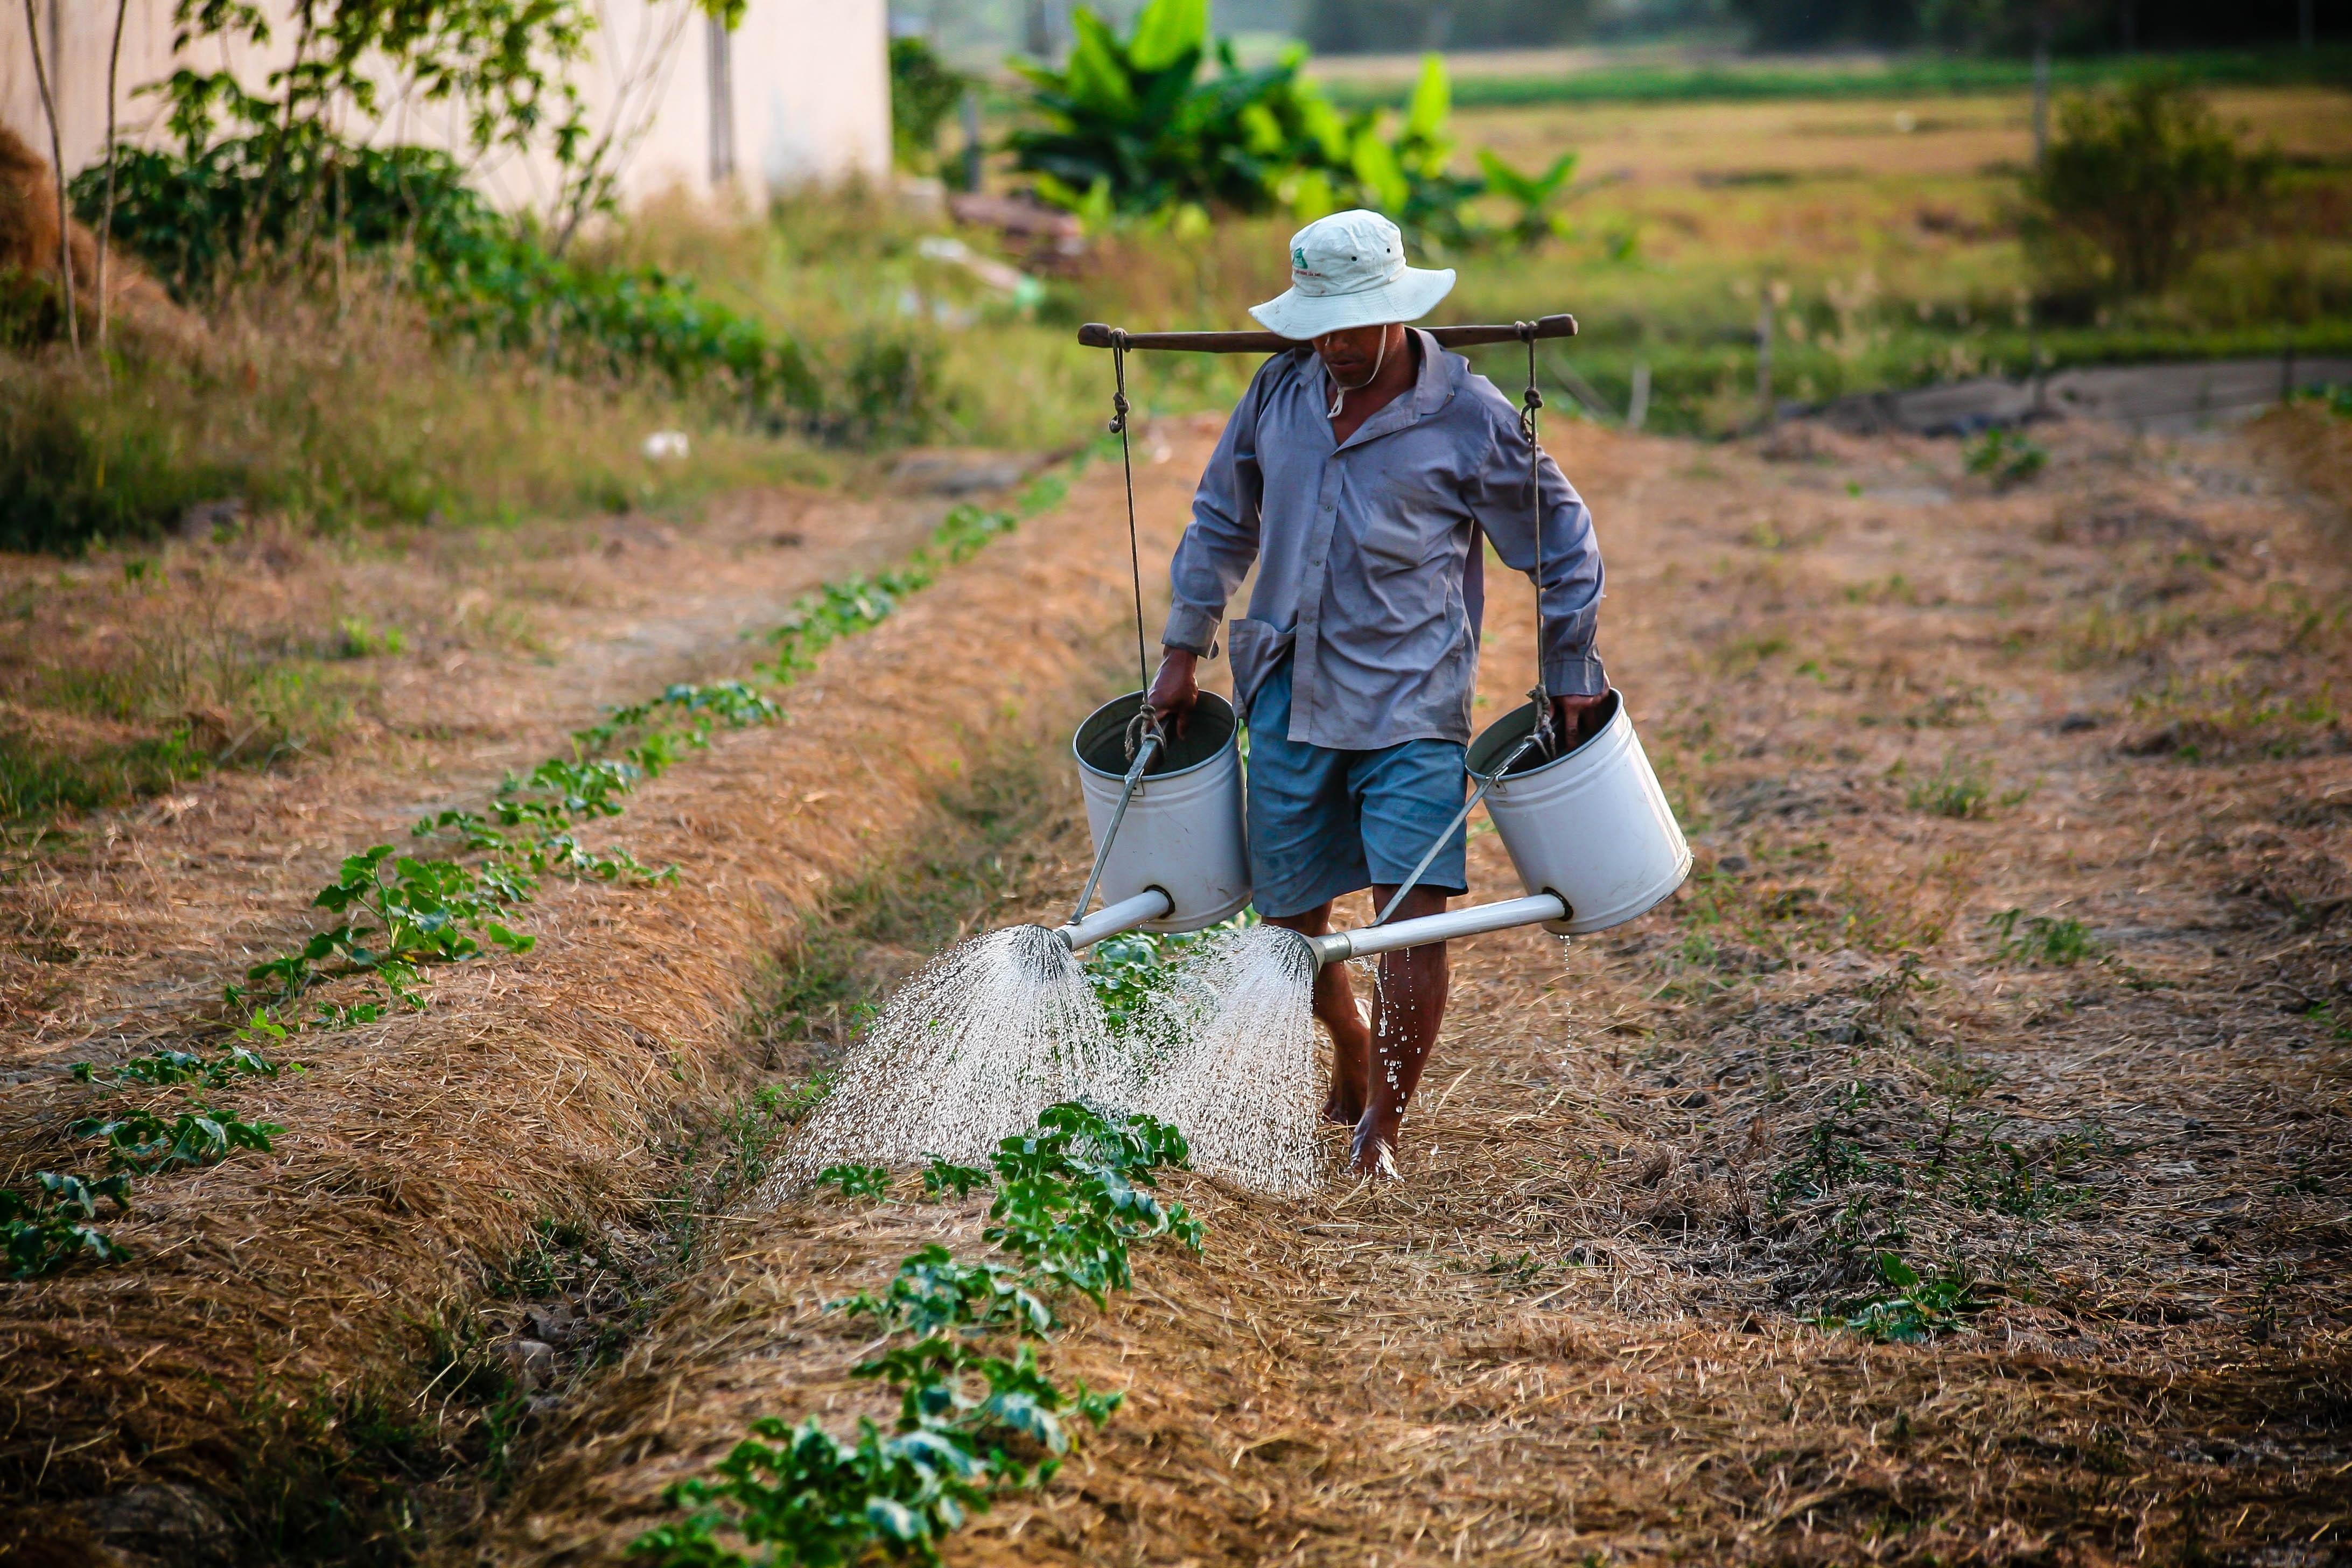 c1c060ff4 hombre árbol bosque césped para caminar sendero campo granja campo rural  suelo agricultura agricultor obrero plantación